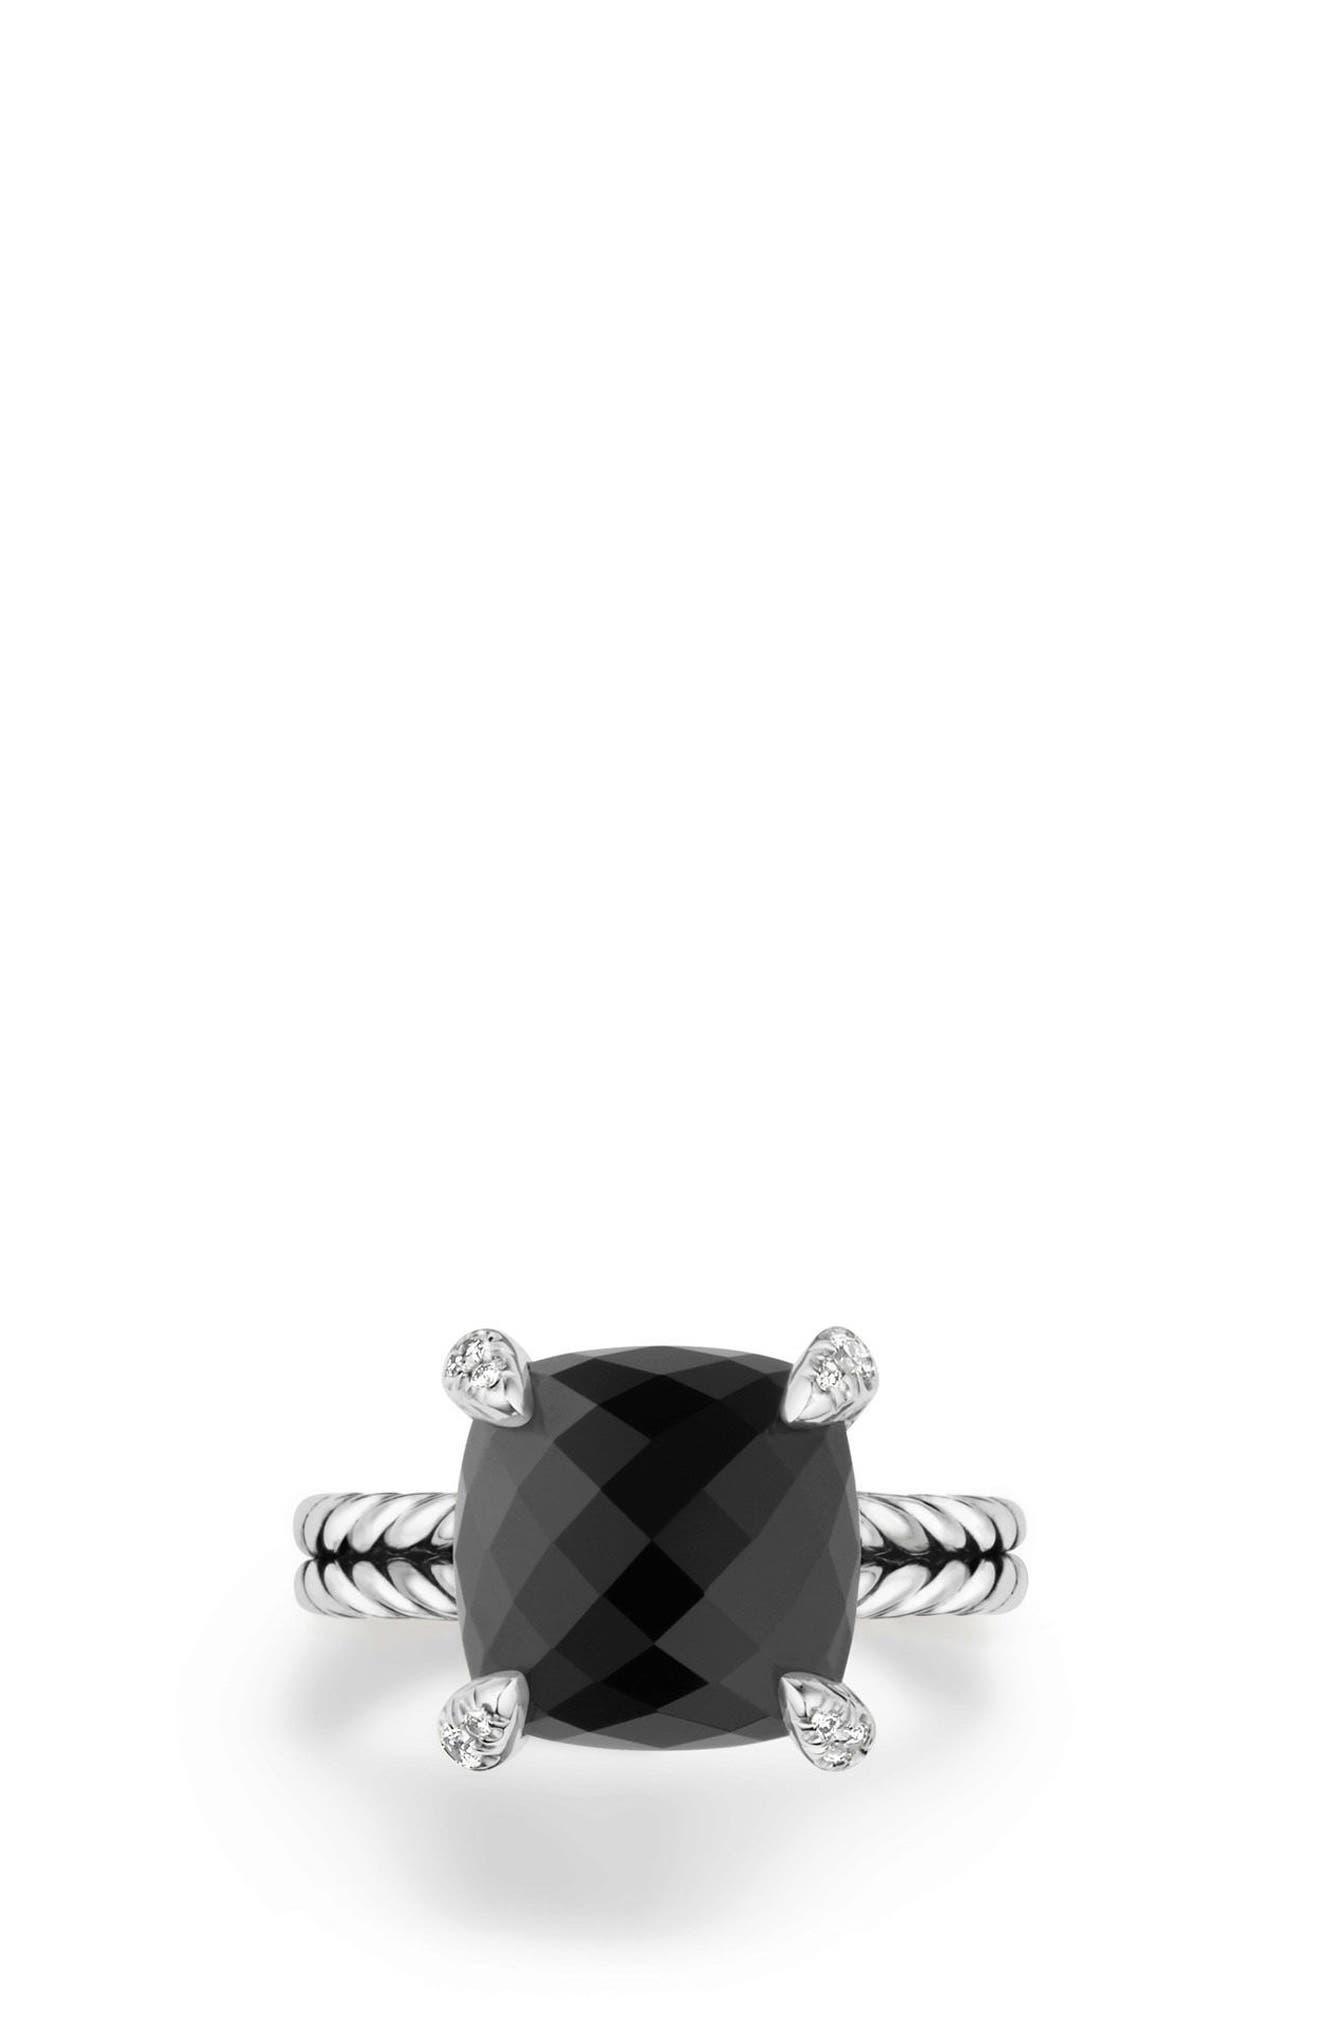 Châtelaine Ring with Semiprecious Stone & Diamonds,                             Alternate thumbnail 3, color,                             BLACK ONYX?